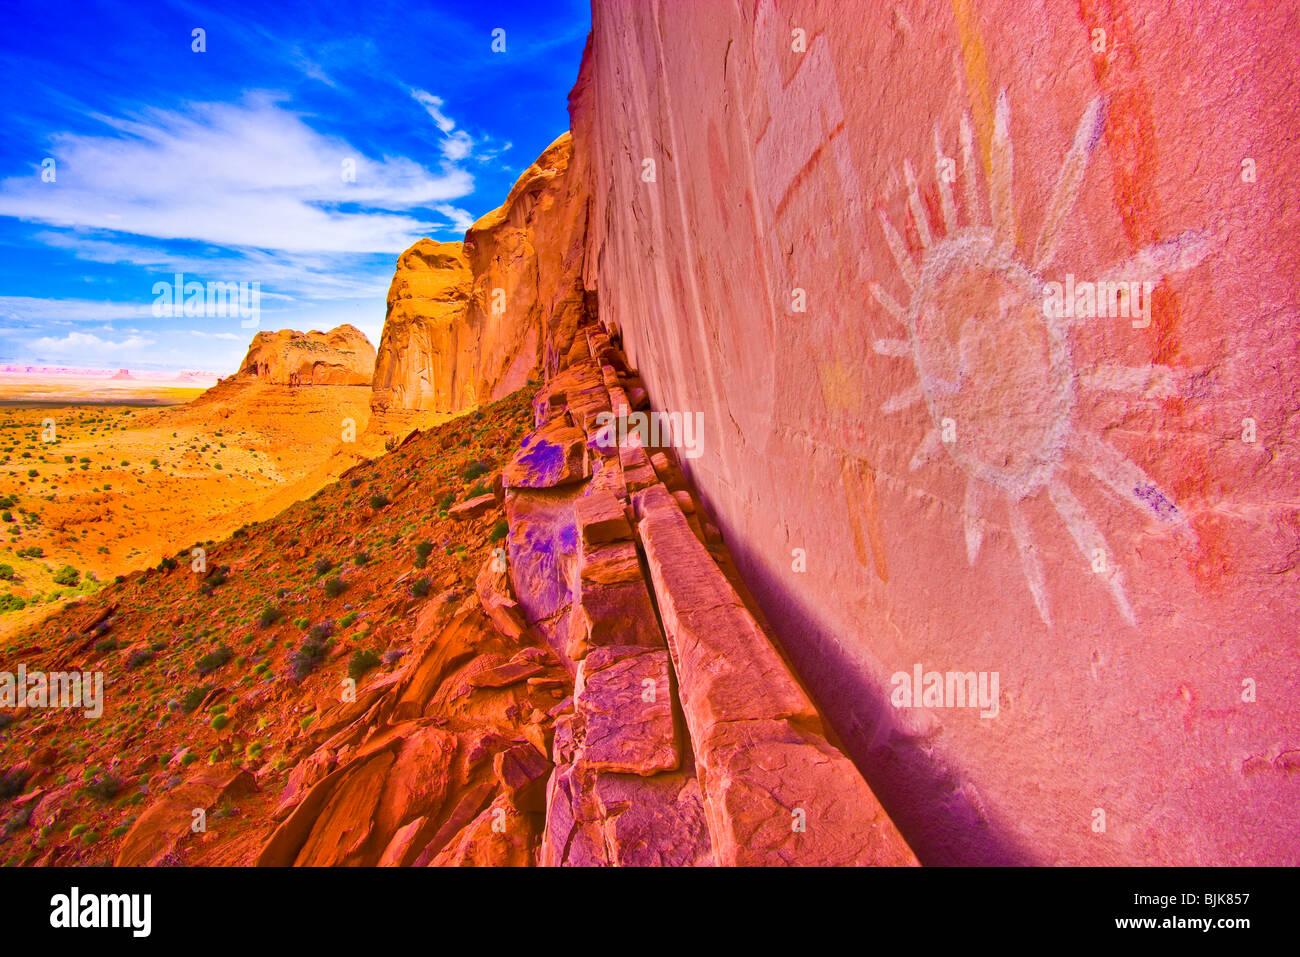 Ancient sun pictograph, Northern Arizona, Basketmaker culture rock paintings - Stock Image